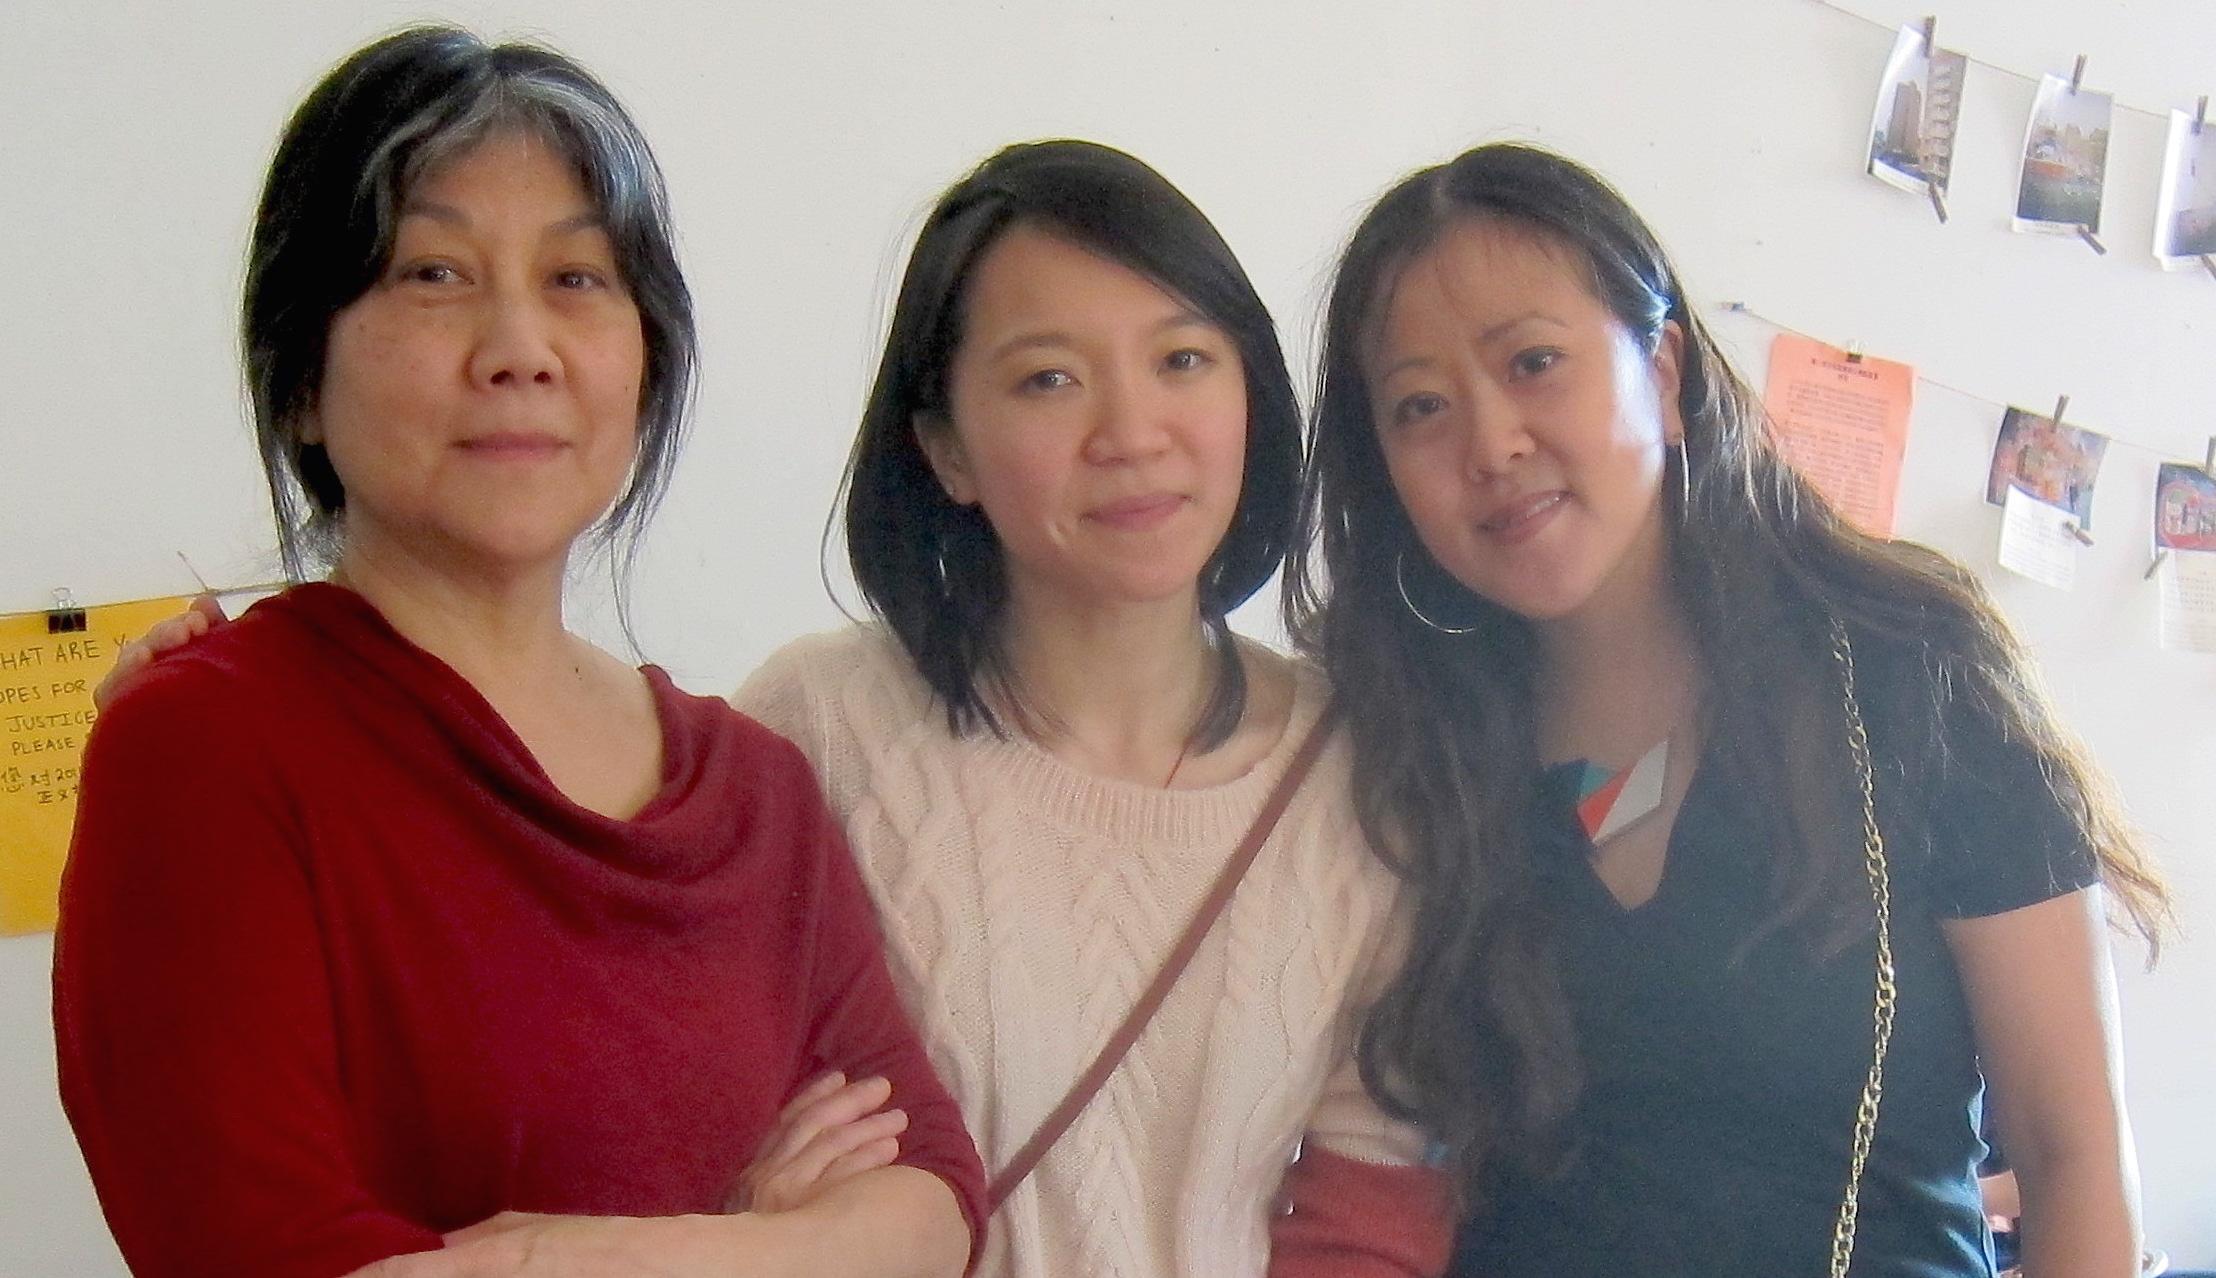 Tomie Arai, ManSee Kong and Betty Yu - founding members of Chinatown Art Brigade.